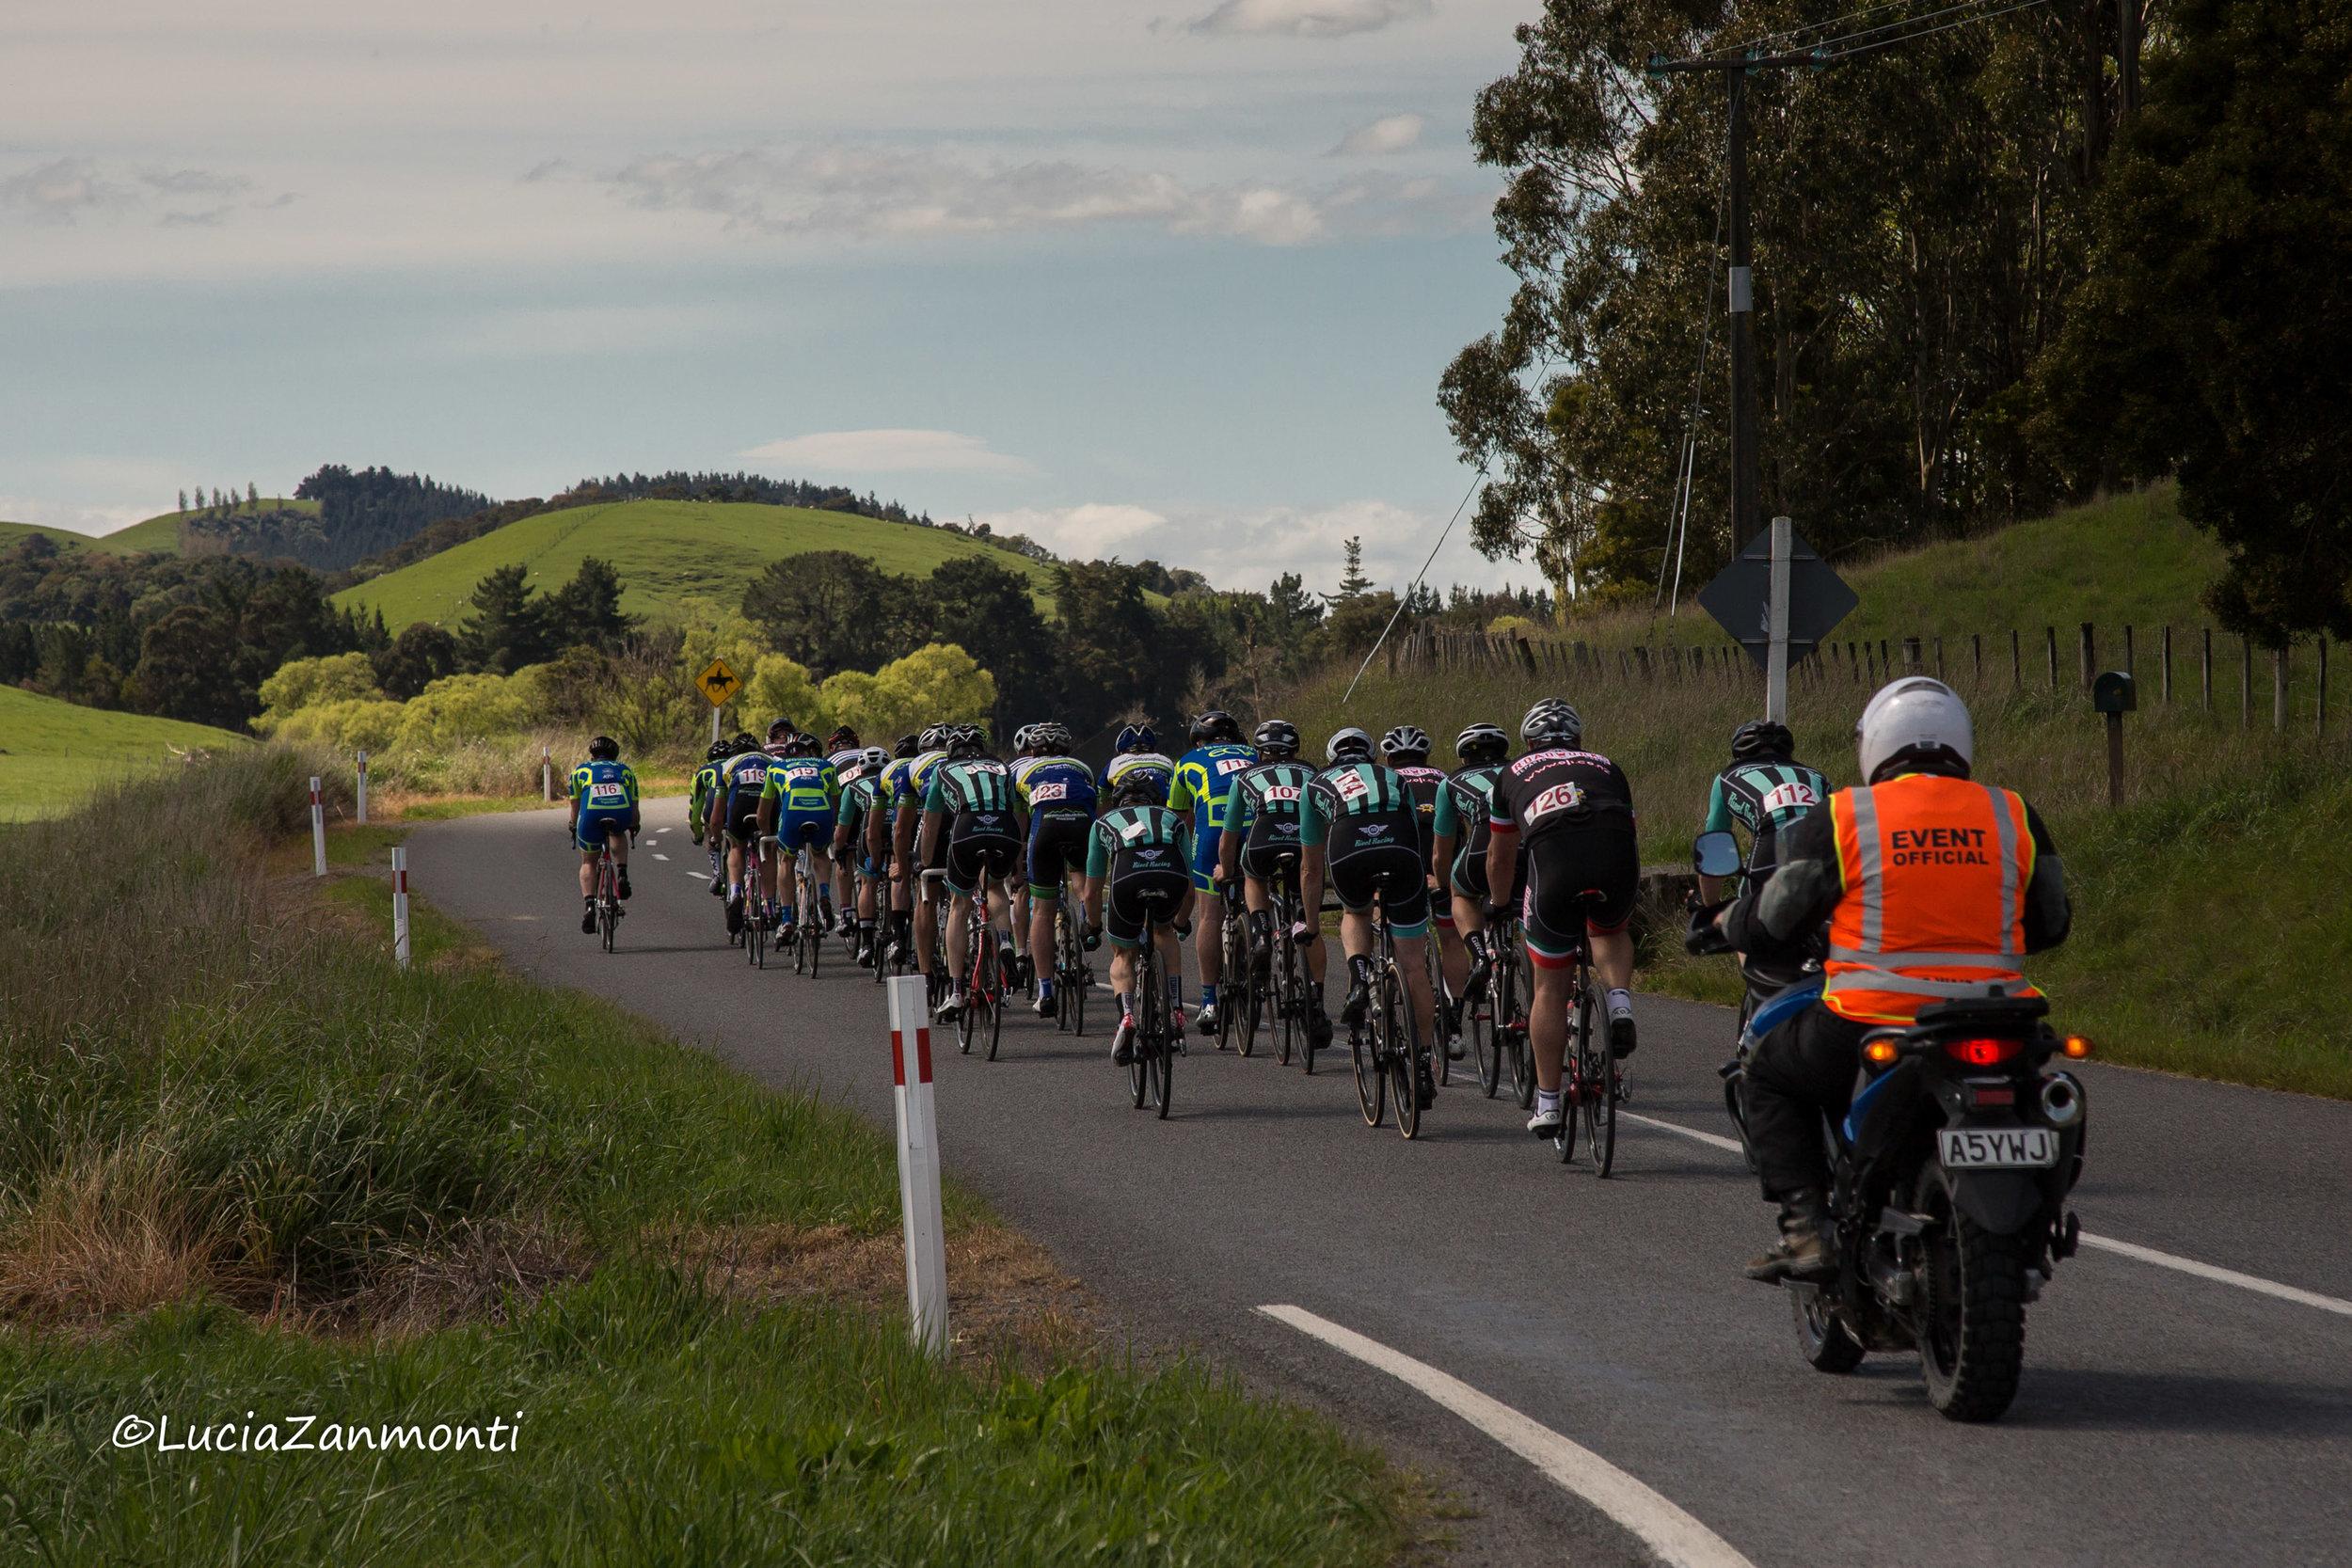 cycling event wairarapa photography.jpg